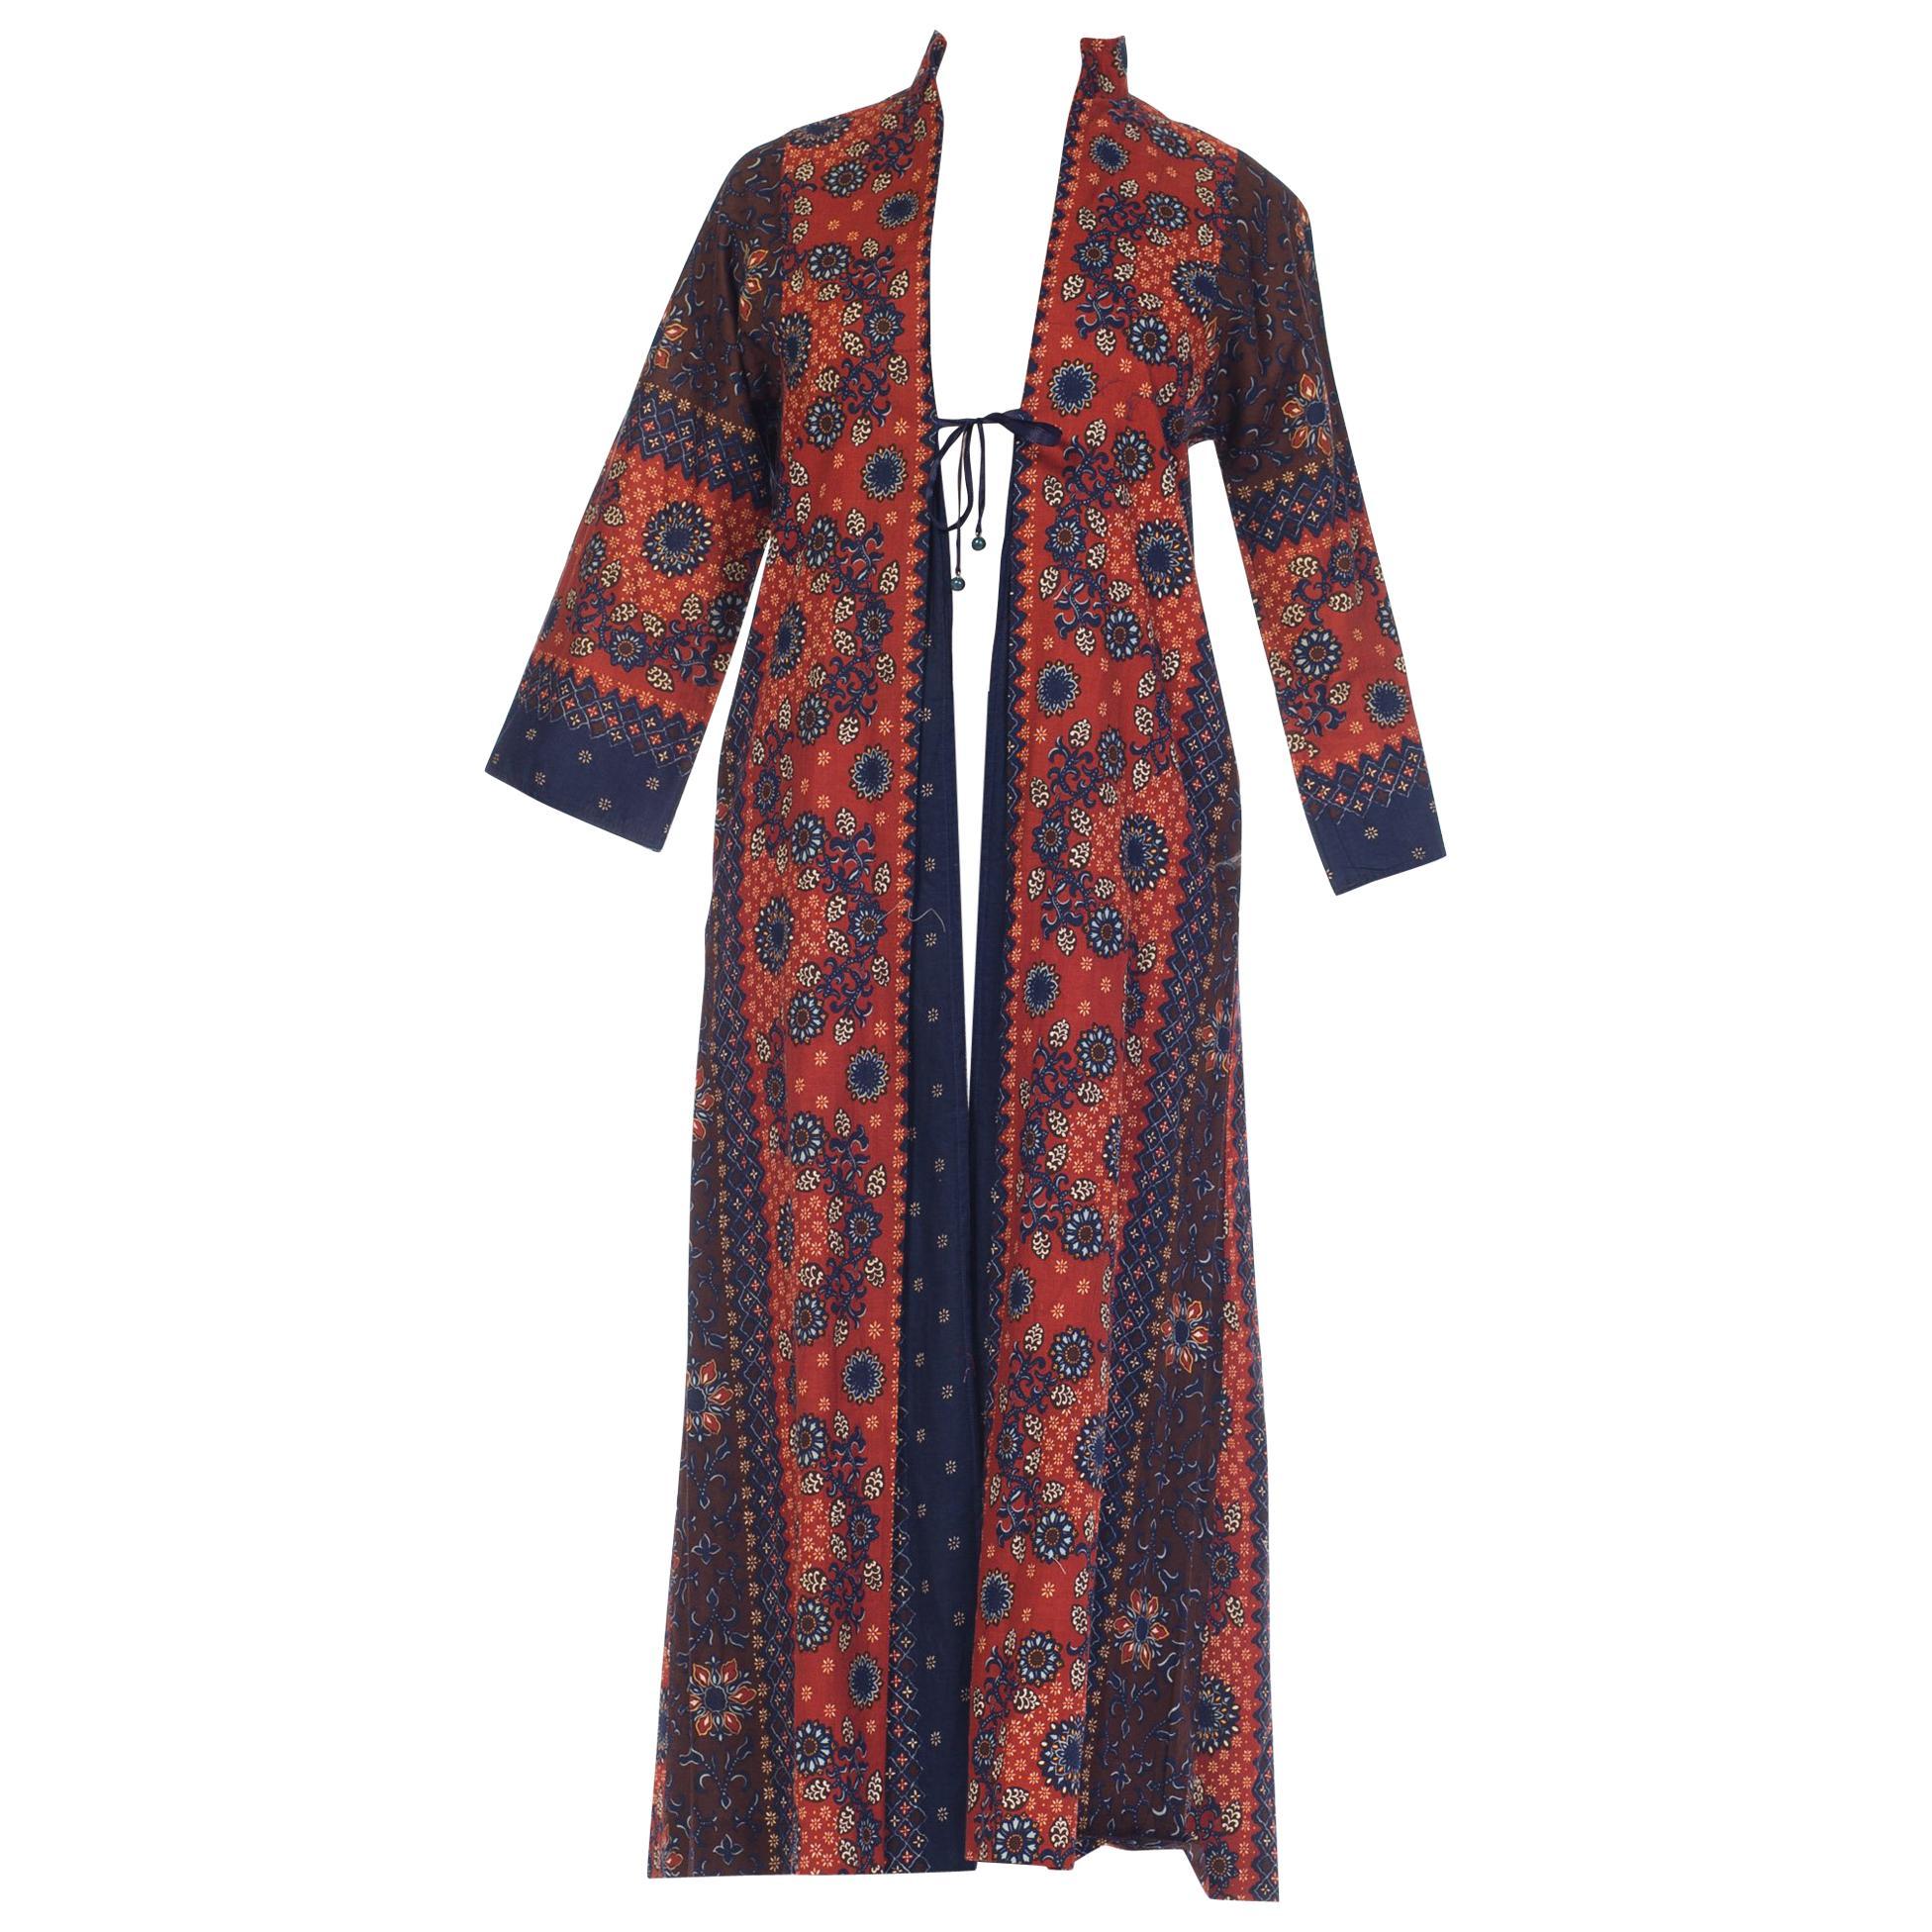 1970S I MAGNIN Brown & Blue Cotton South East Asian Batik Print Duster Kaftan